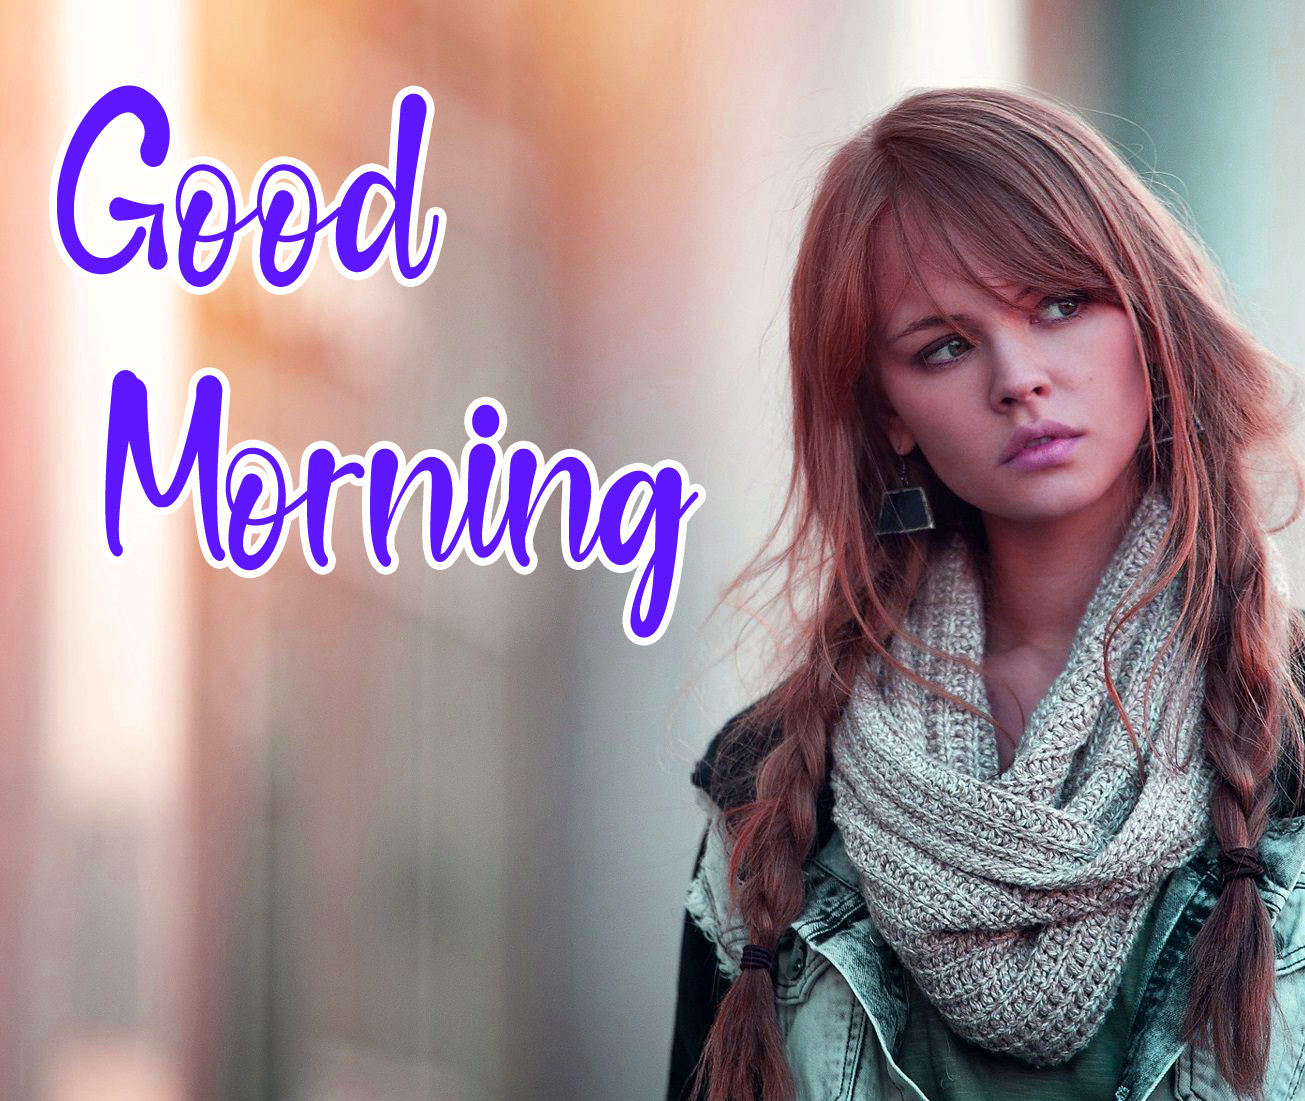 good morning Images for girls 1